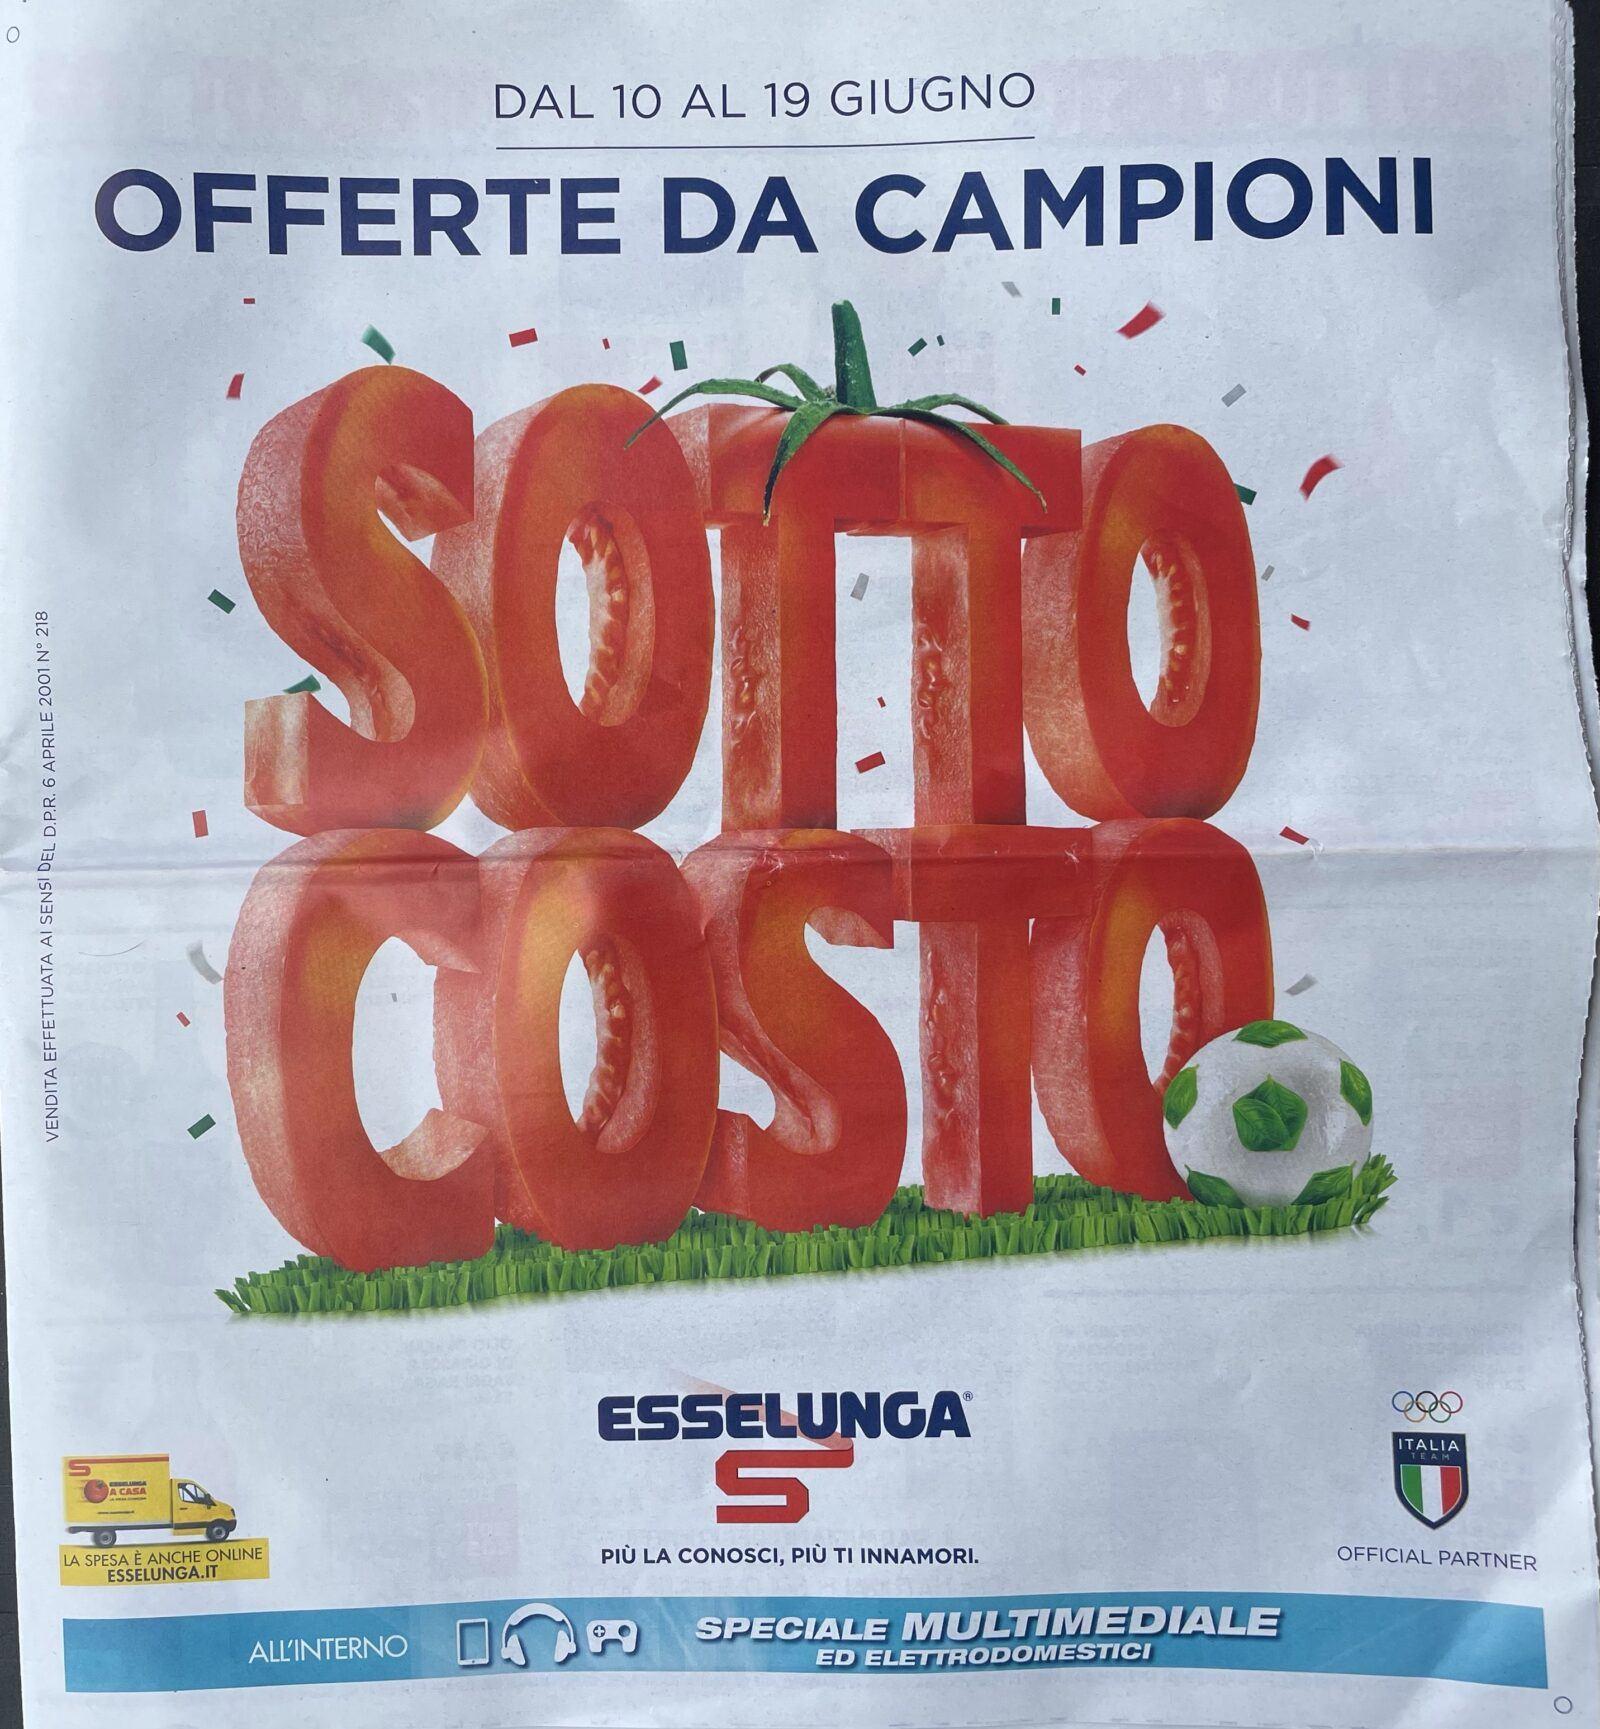 www.scontrinofelice.it img 7127 2 1600x1729 Anteprima volantino Esselunga valido dal 10/06 al 19/06 2021